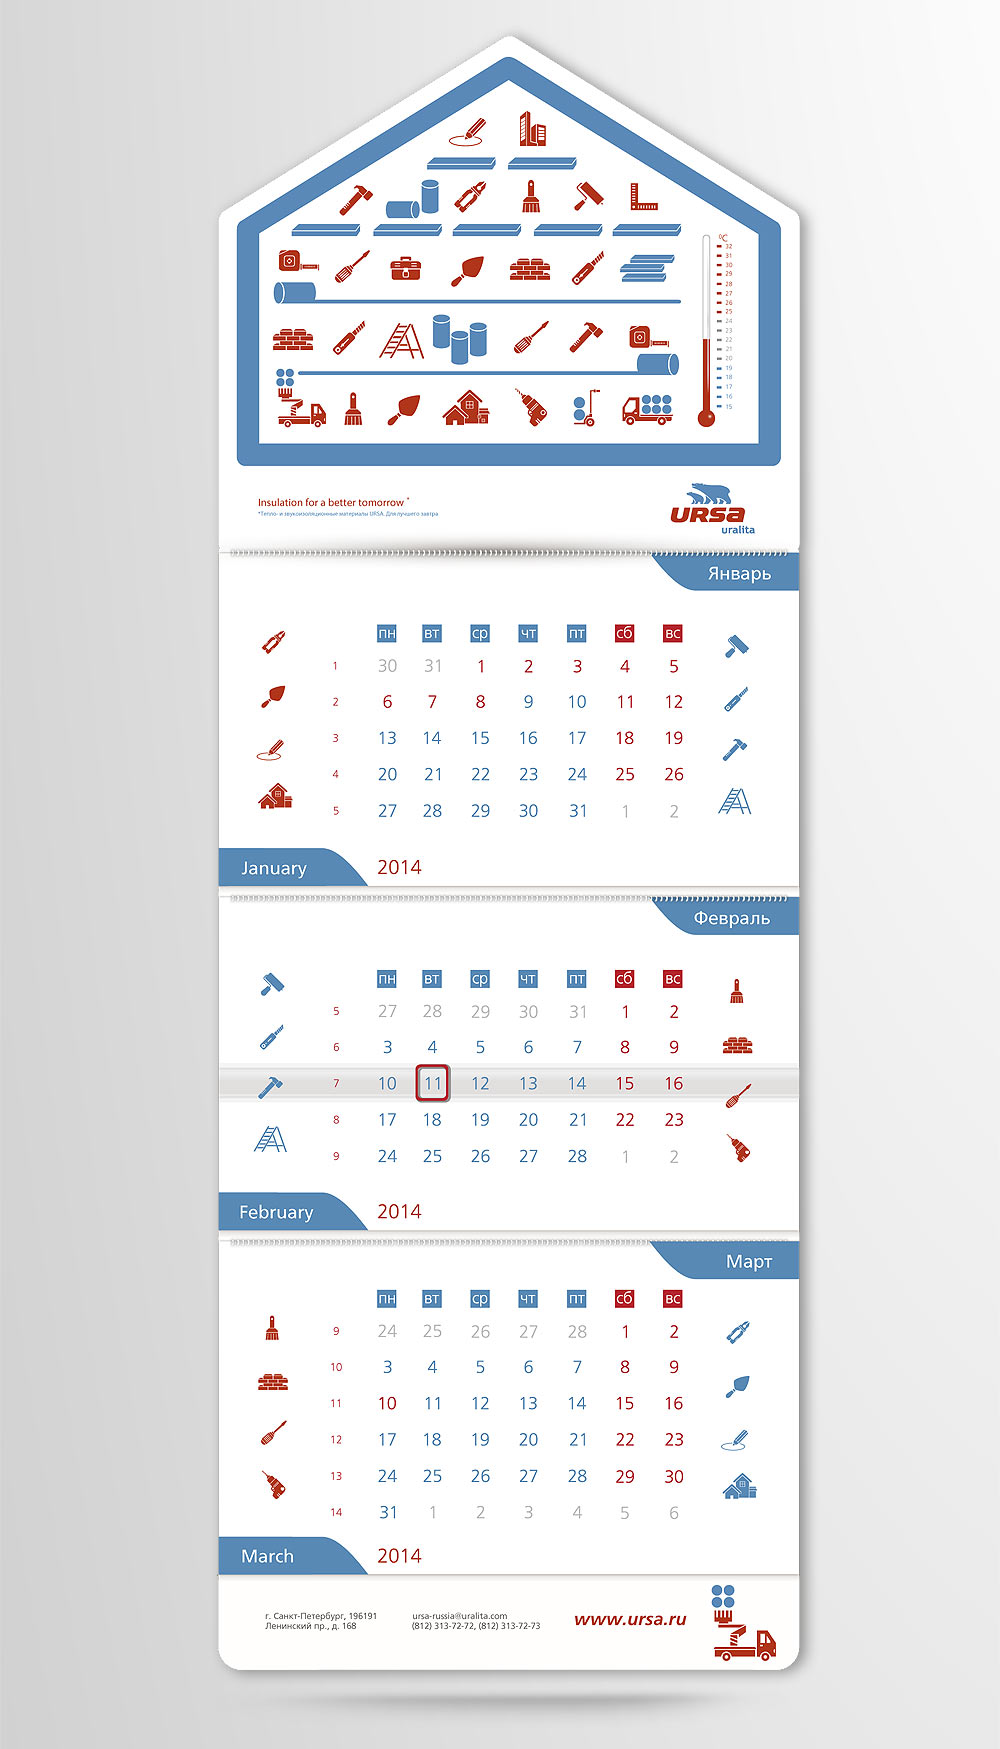 Квартальный календарь URSA